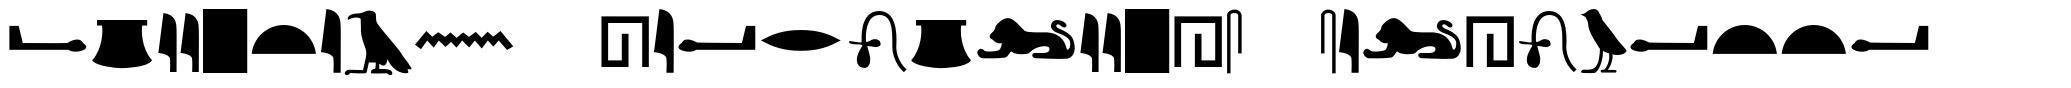 Egyptian Hieroglyphs Silhouette